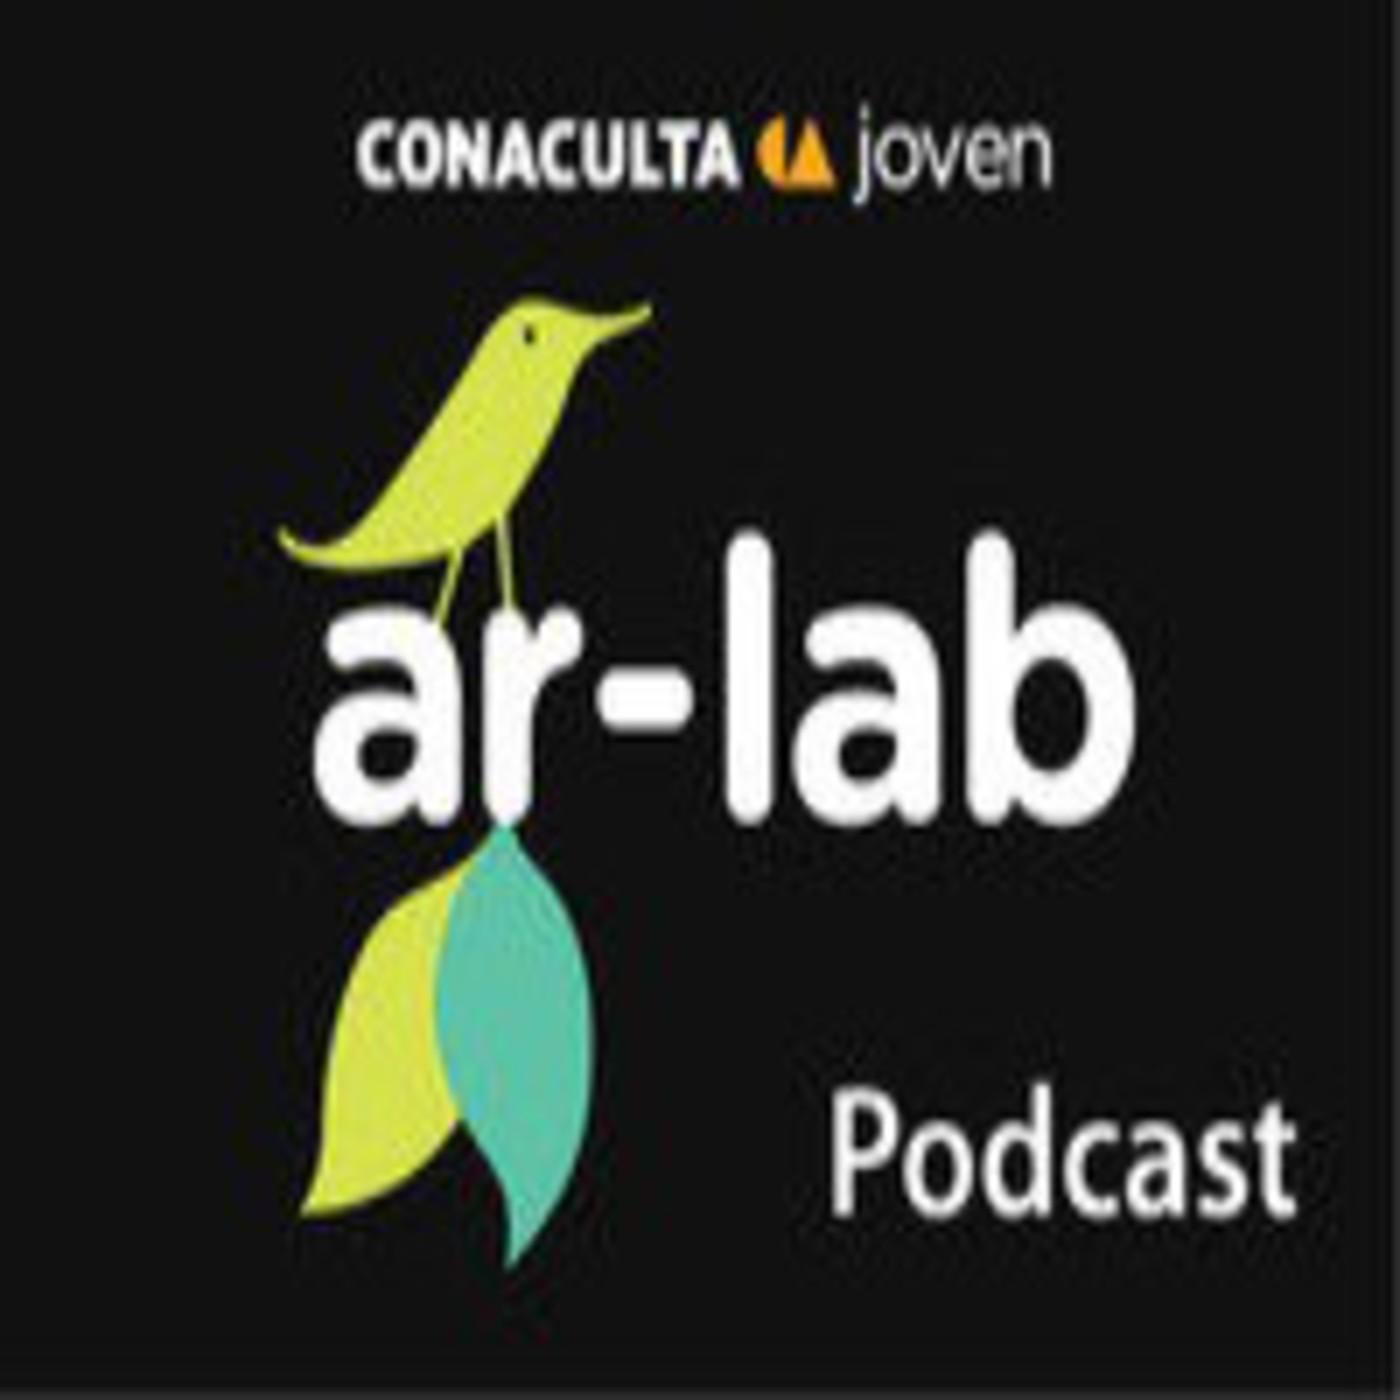 <![CDATA[Podcast AR Lab]]>